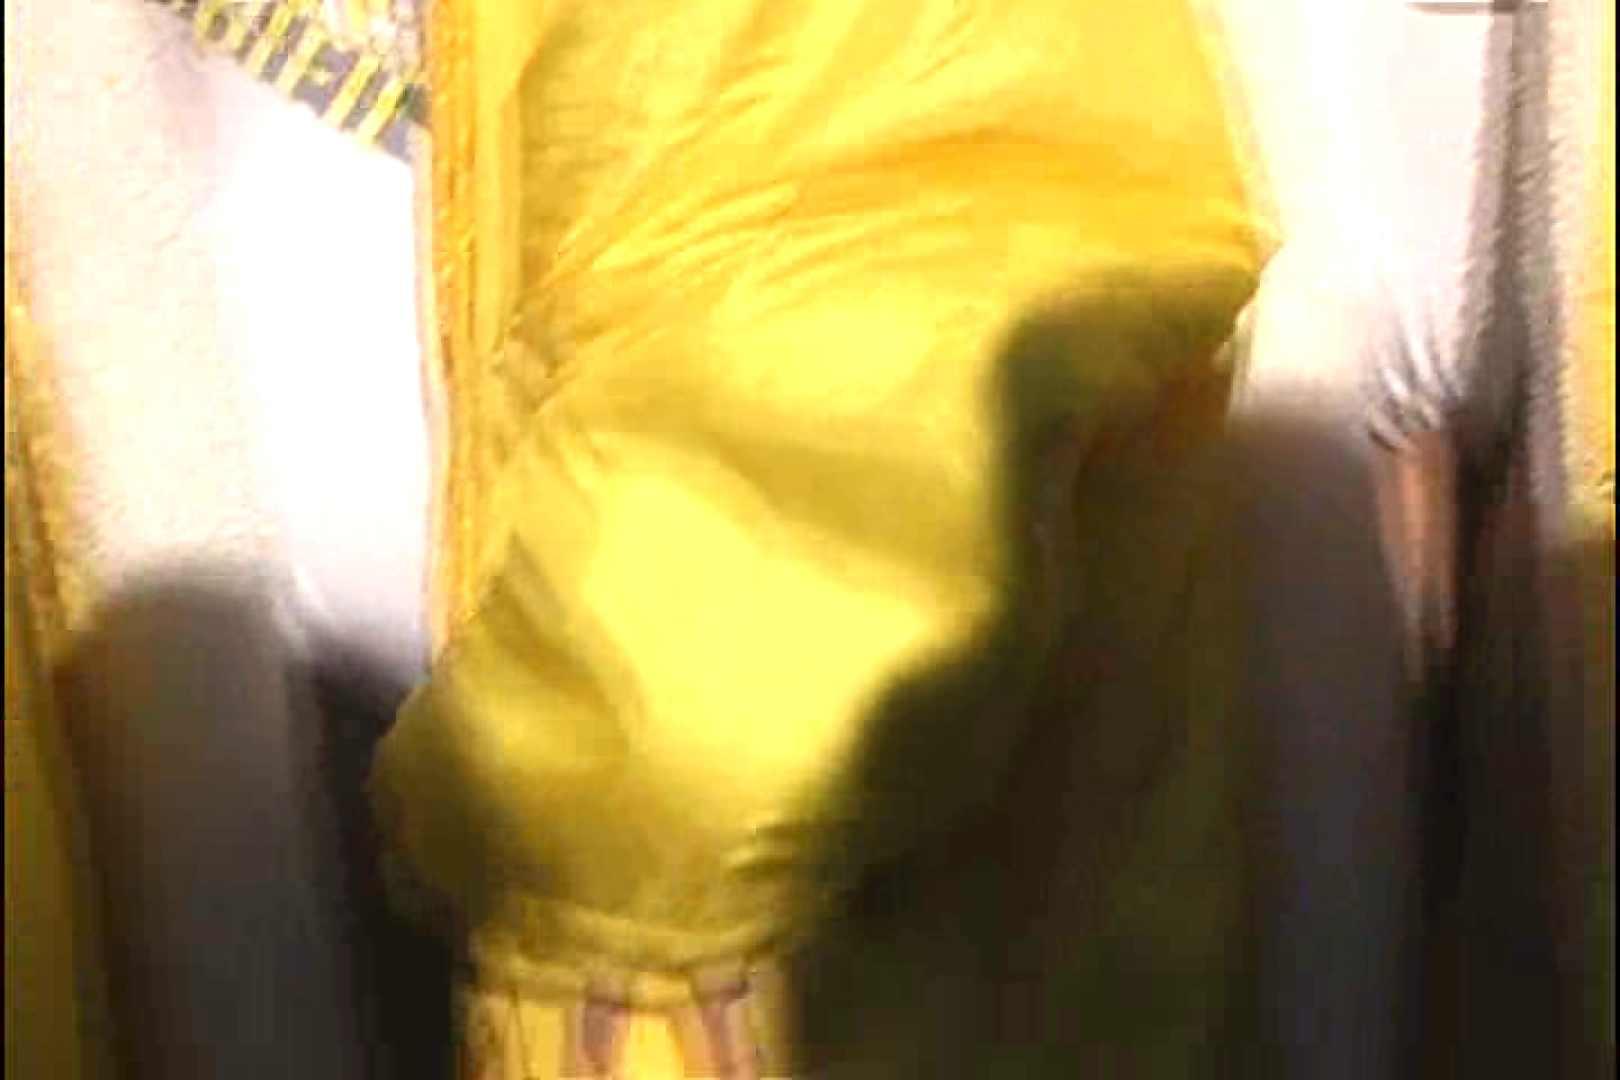 RQカメラ地獄Vol.13 レースクイーン 盗撮おめこ無修正動画無料 95画像 69